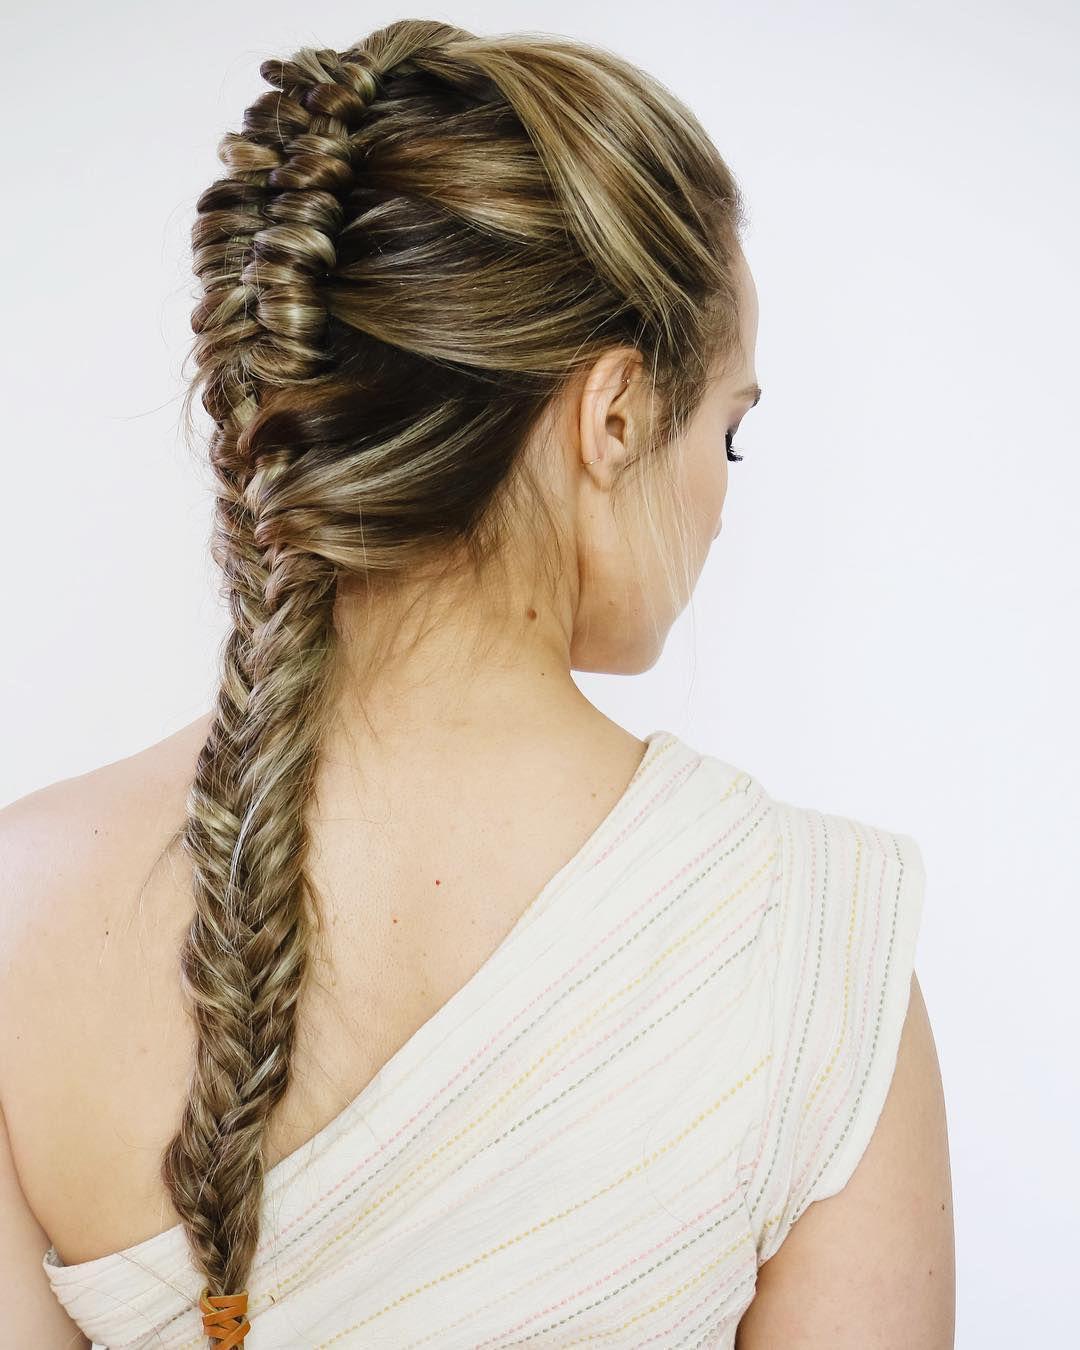 Wedding Hairstyle Ladies: 8 Stunning Wedding Hairstyles Inspired By Wonder Woman